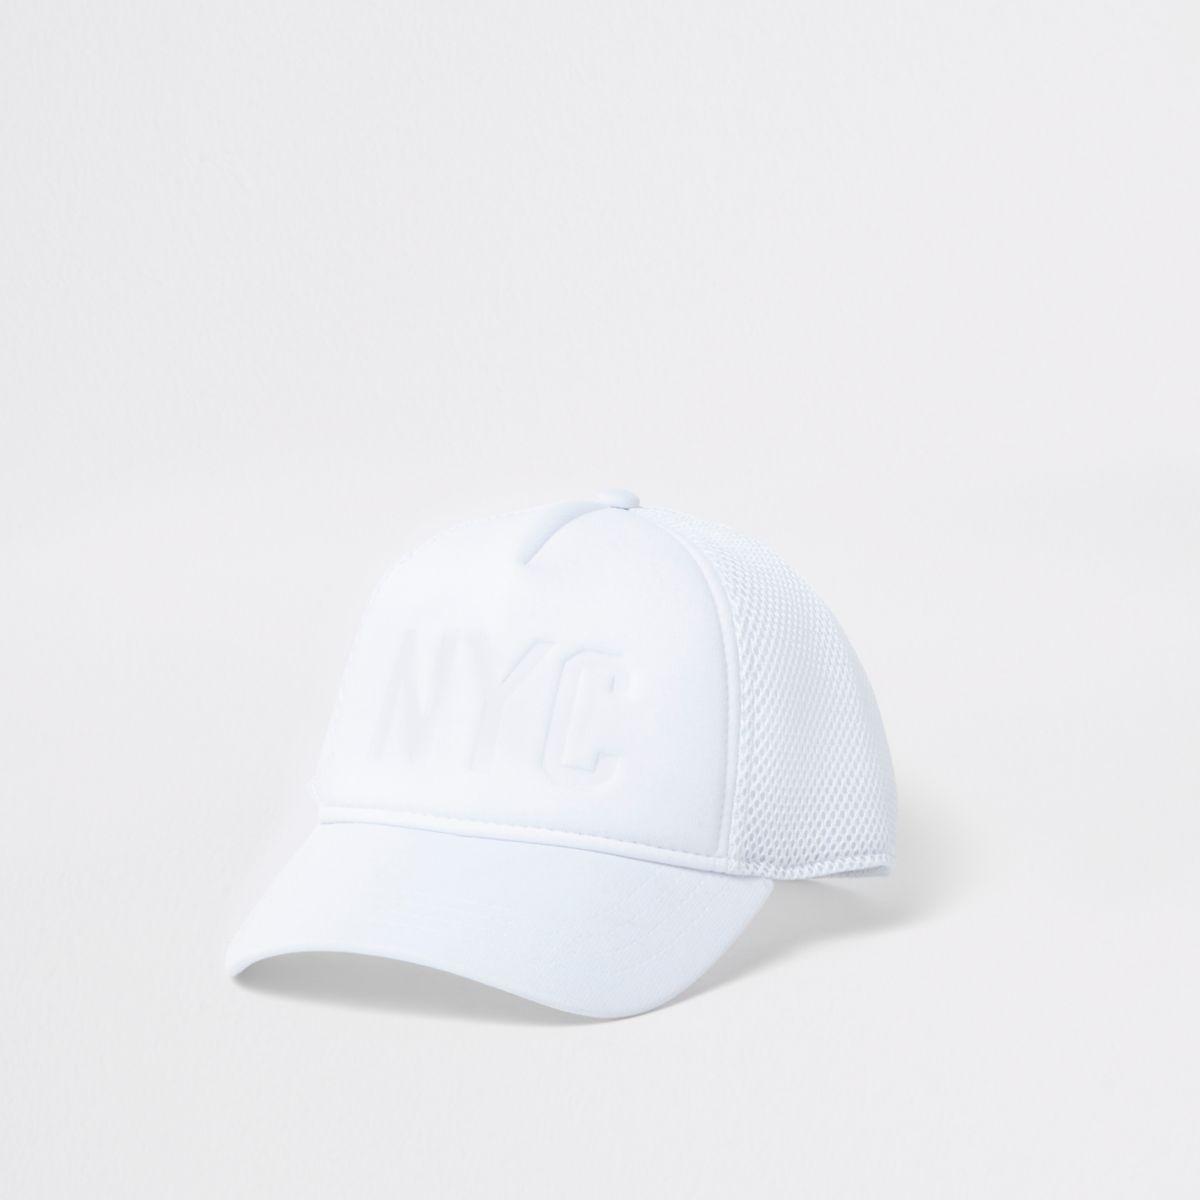 White 'NYC' baseball cap